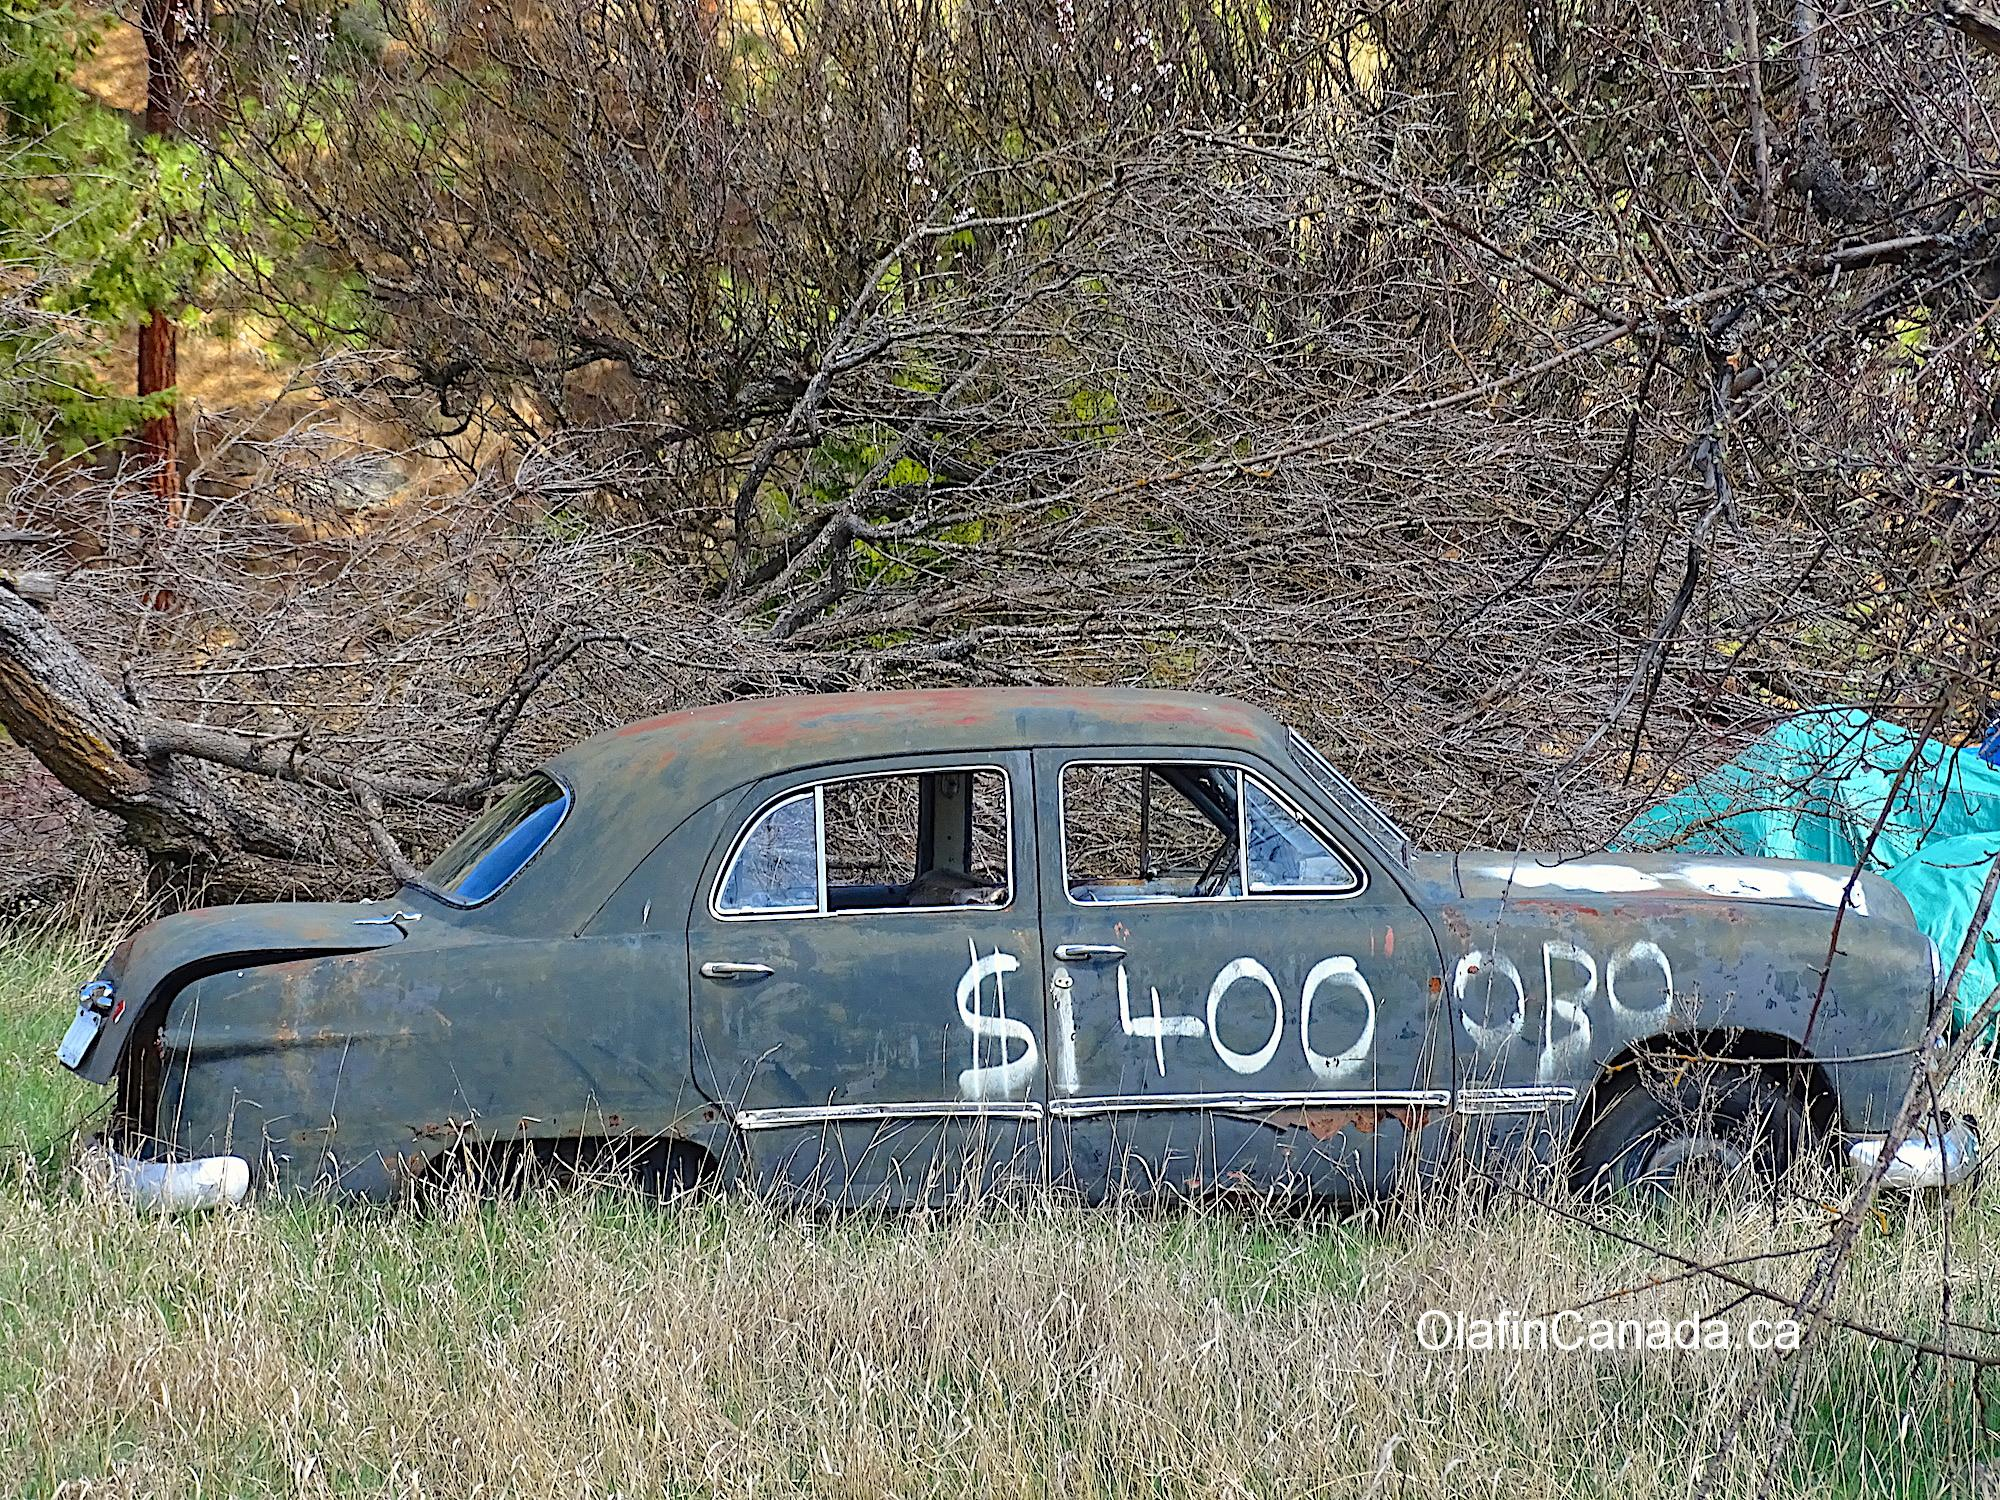 Car for sale near Grand Forks BC #olafincanada #britishcolumbia #discoverbc #abandonedbc #grandforks #car